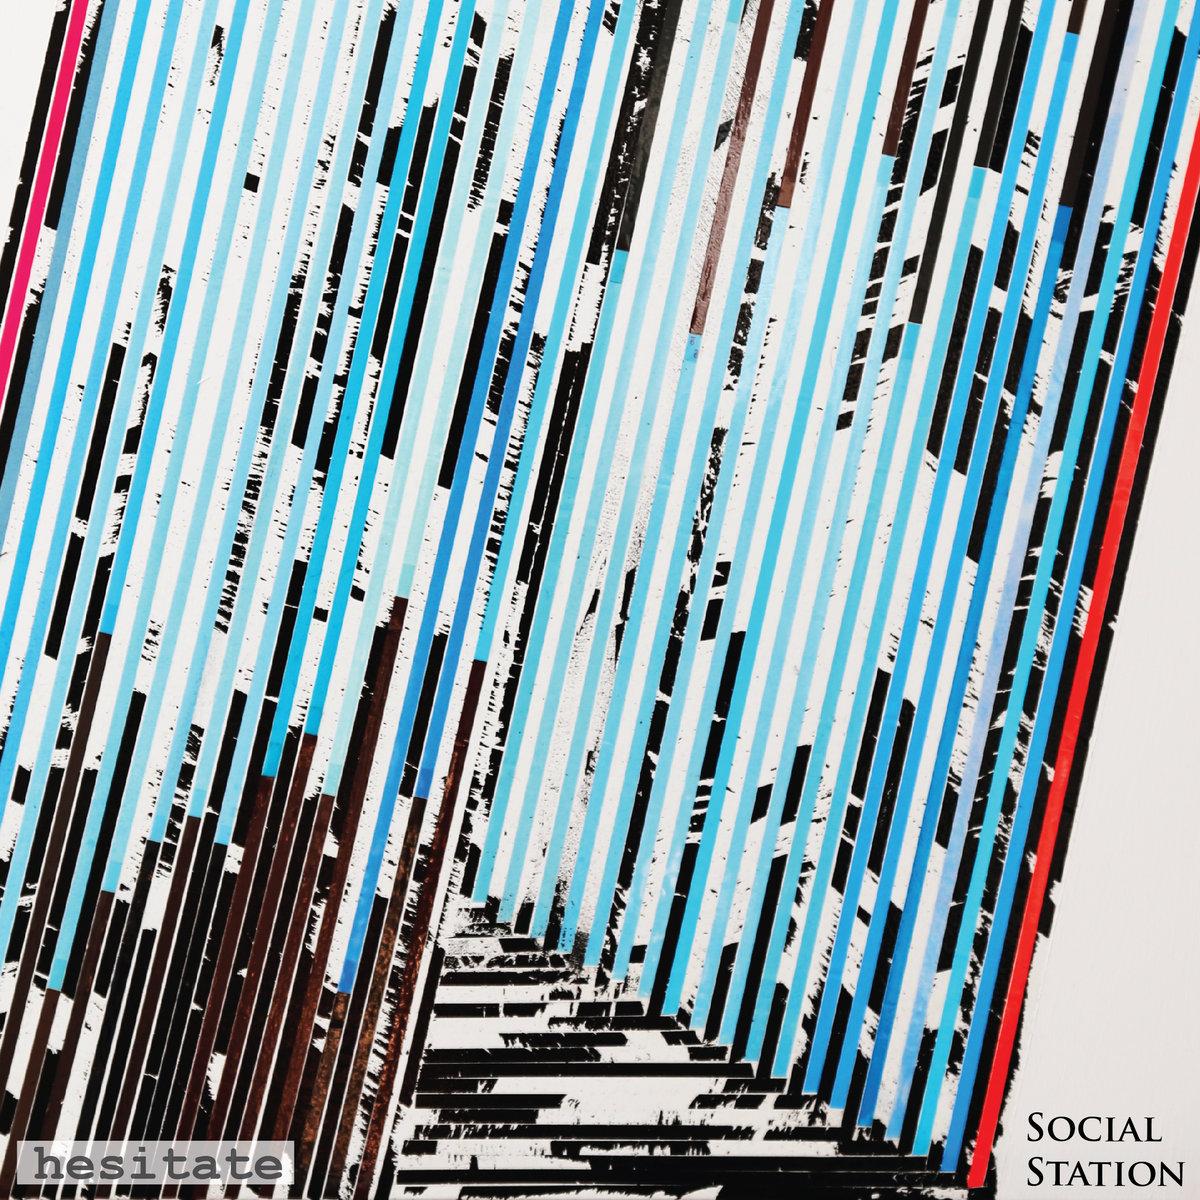 Single of the week – Social Station – Hesitate